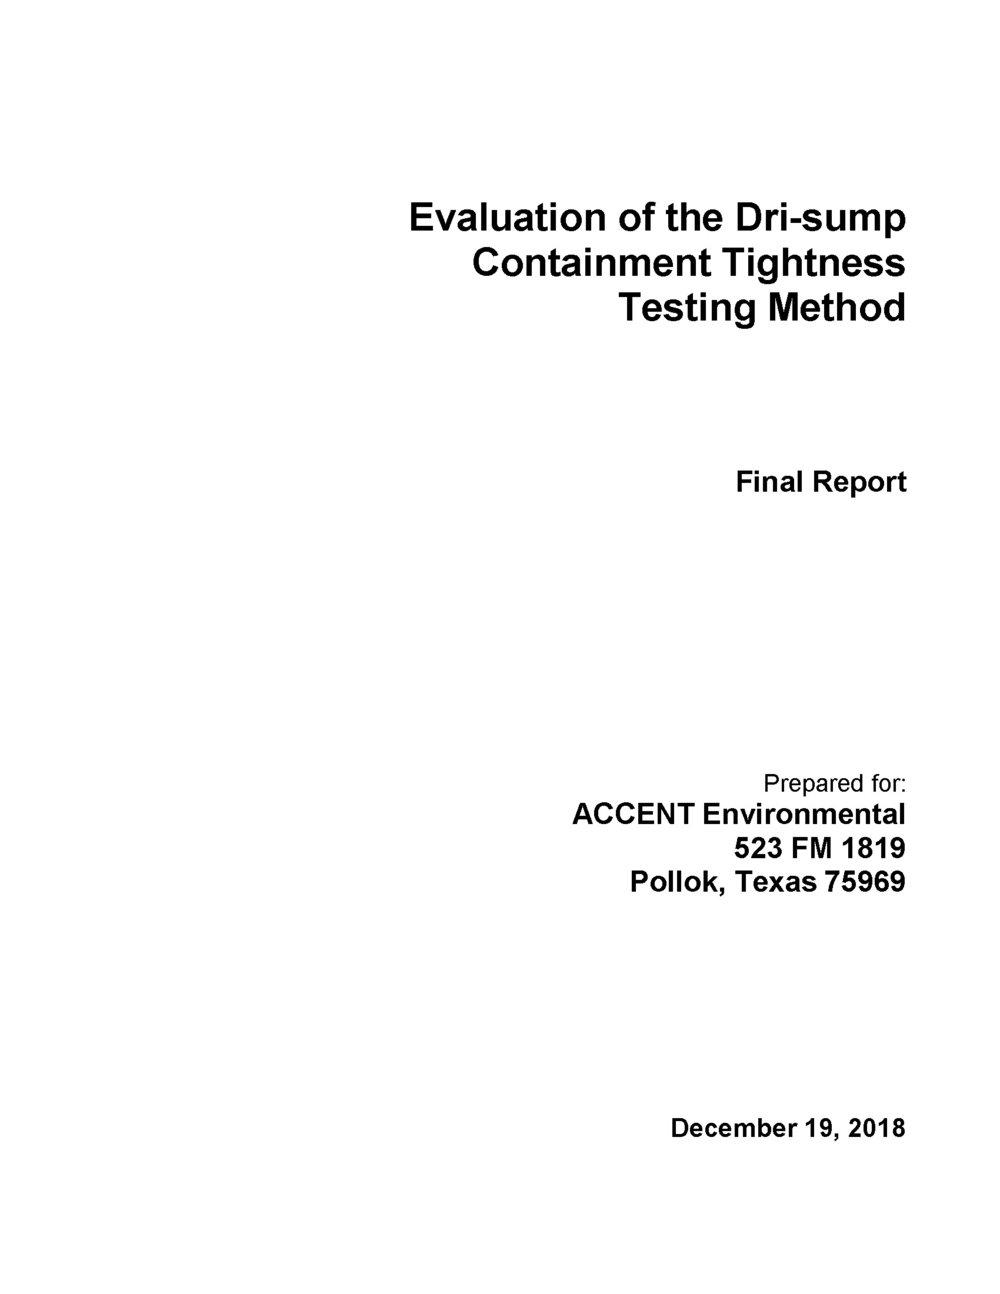 KWA Final Report Dri Sump 12 19 2018_Page_02.jpg